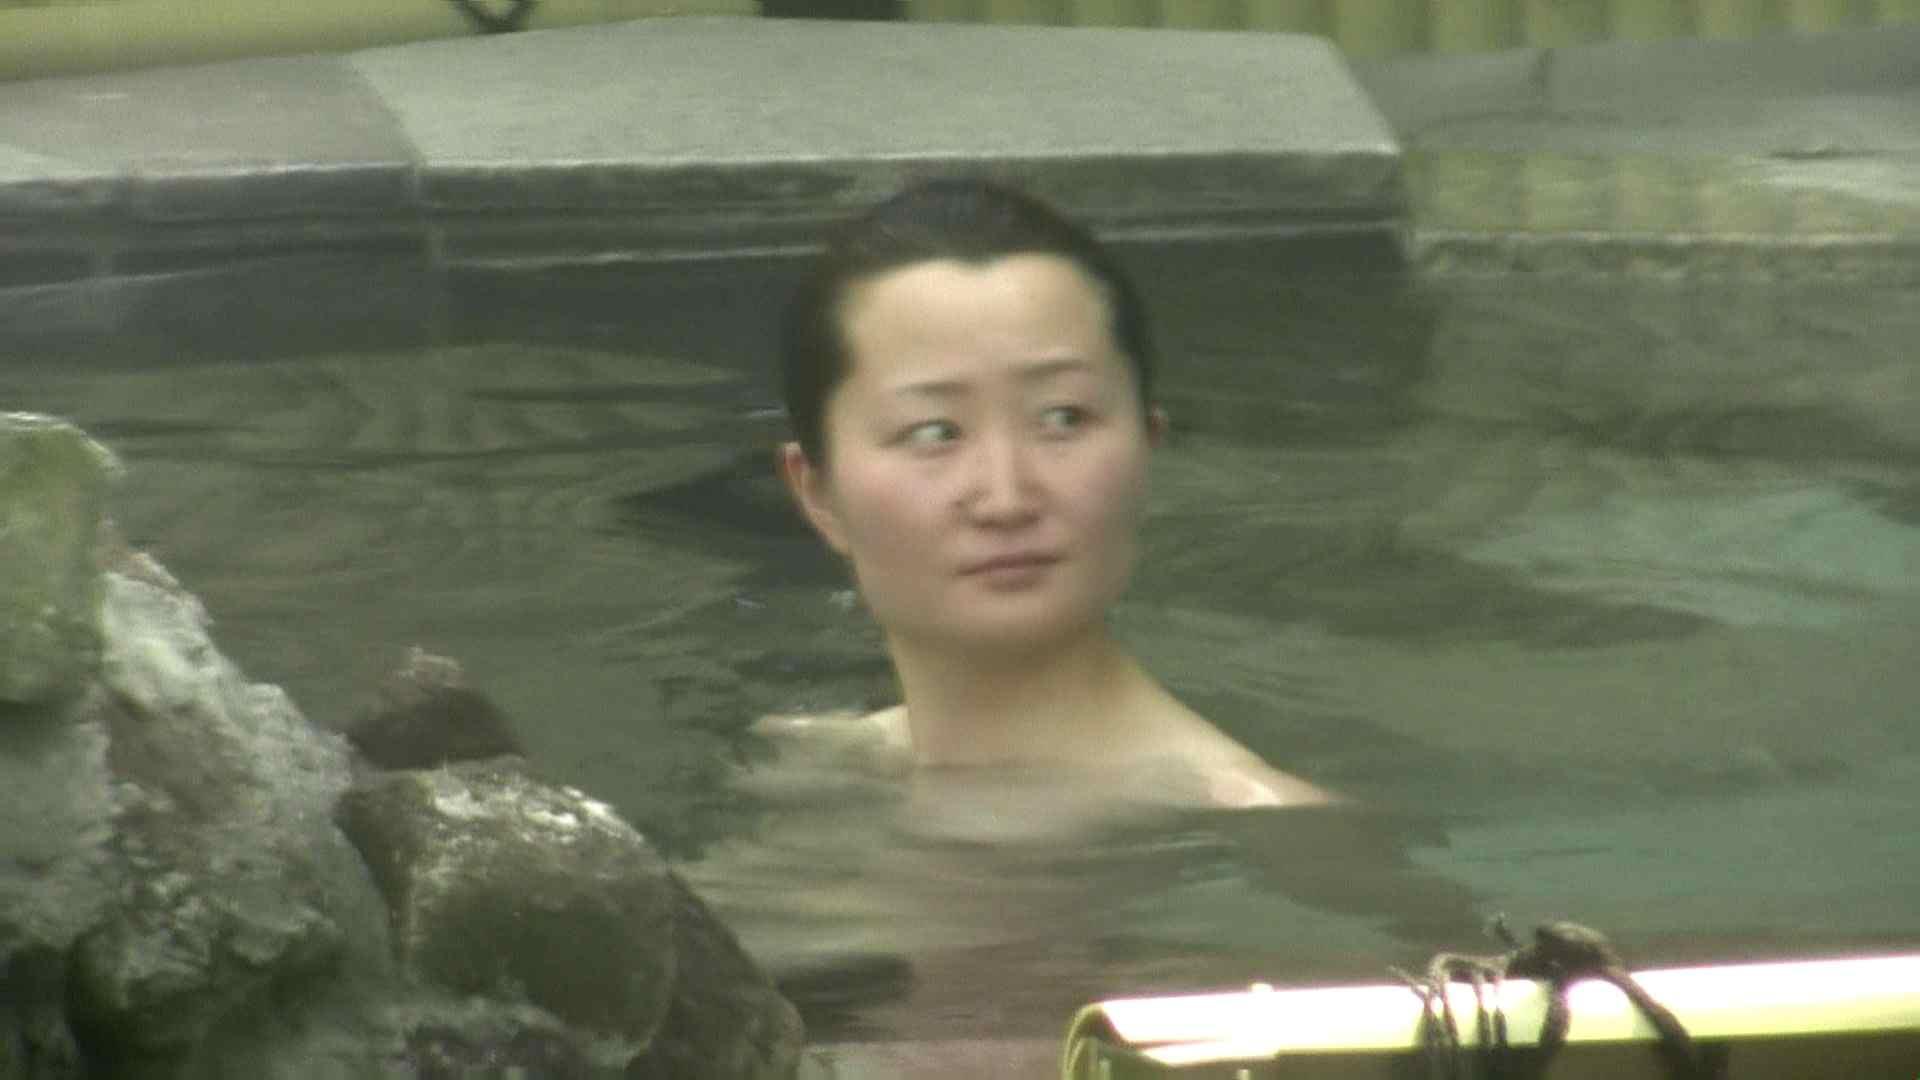 Aquaな露天風呂Vol.632 盗撮 | OLエロ画像  41PICs 19